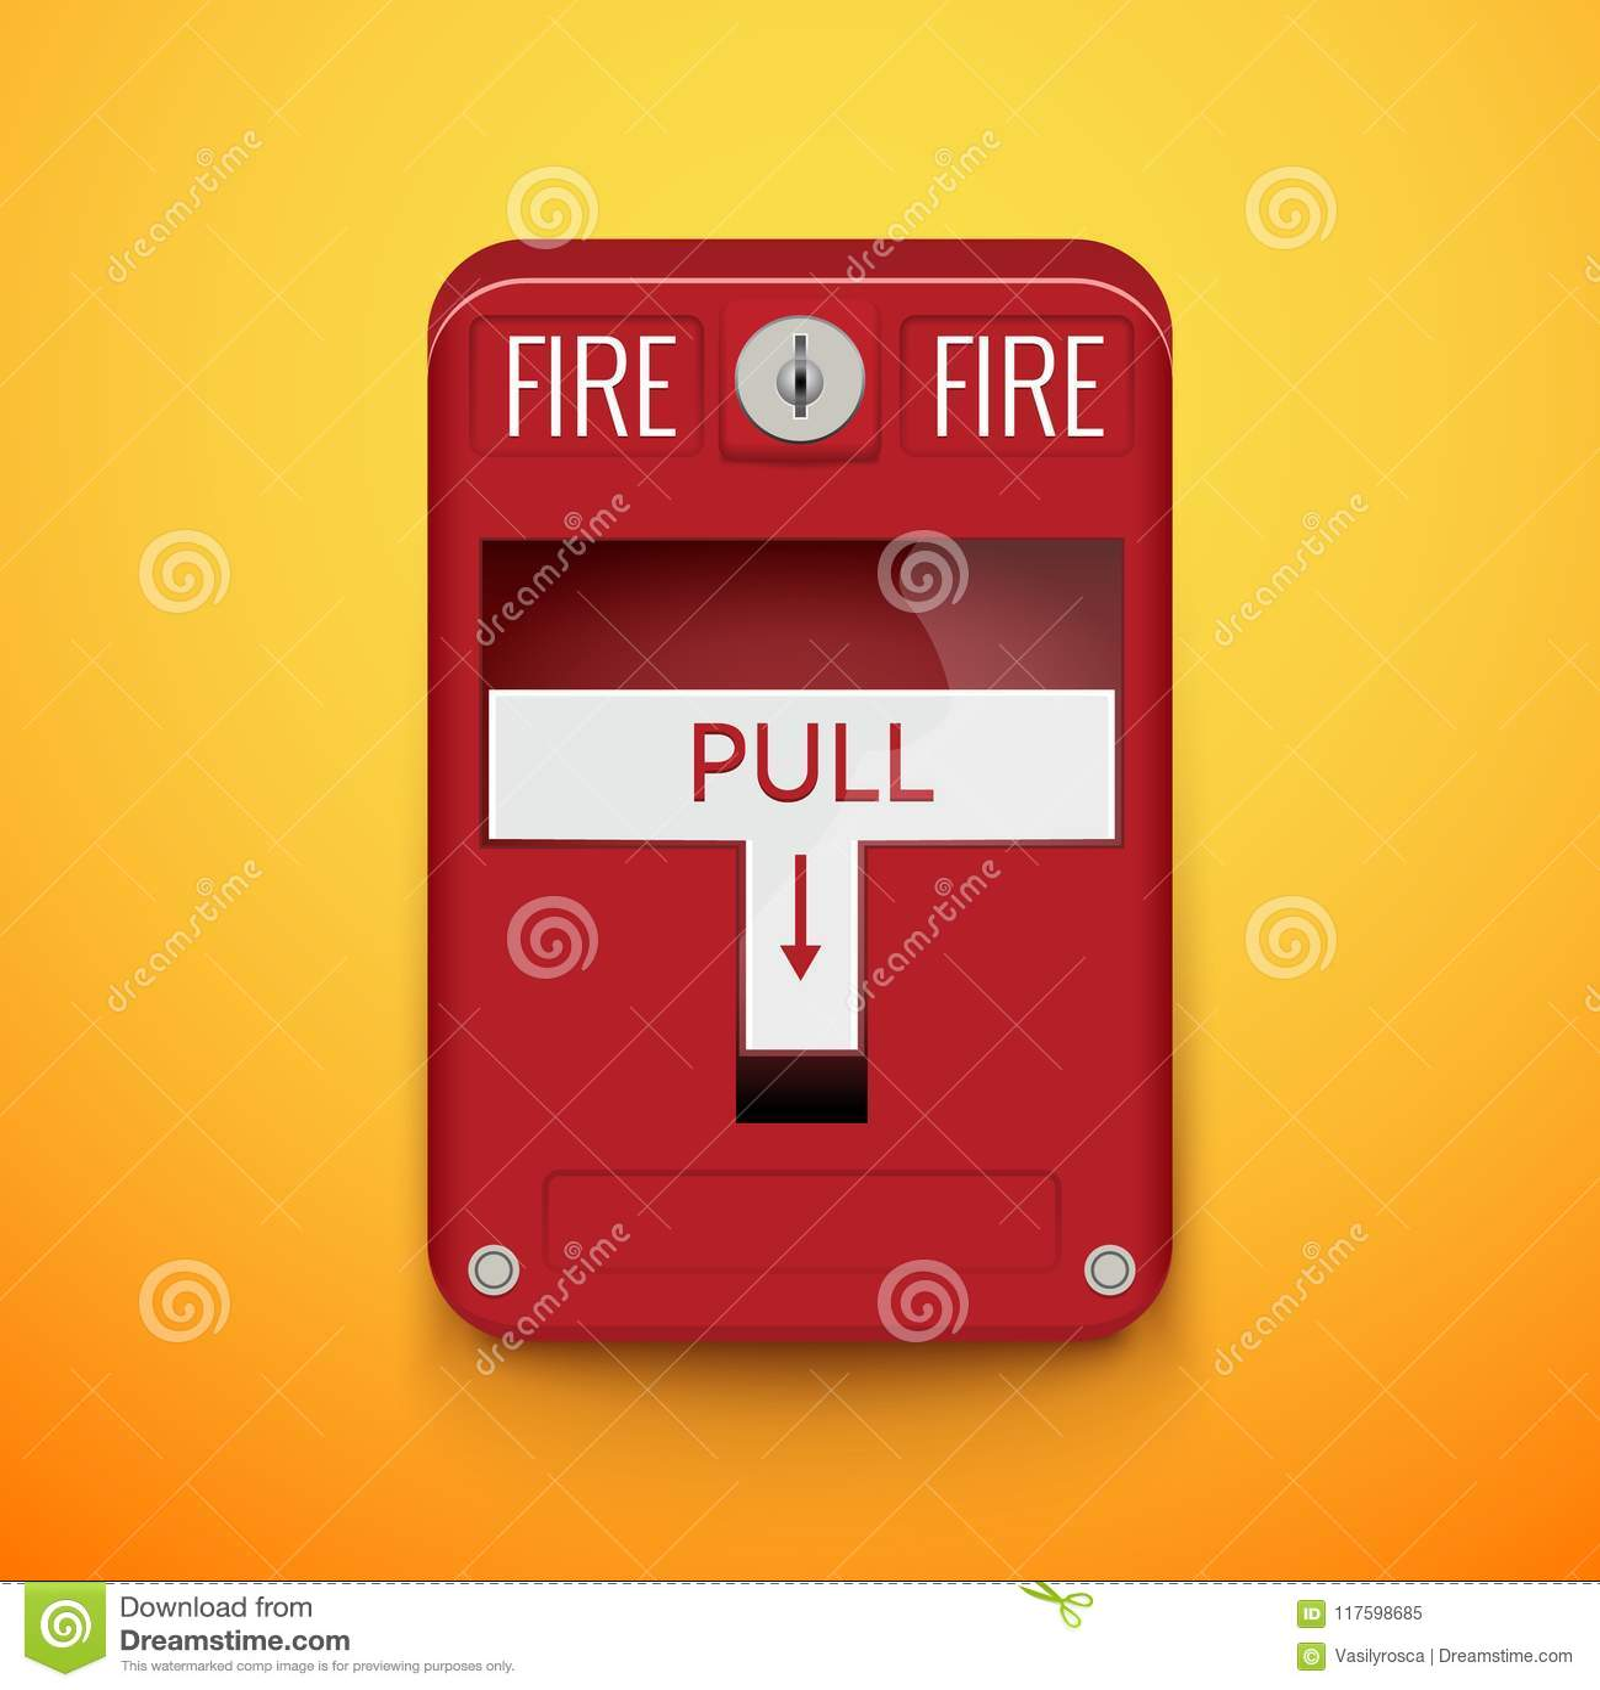 Fire Alarm System Pull Danger Fire Safety Box Break Red Alarm